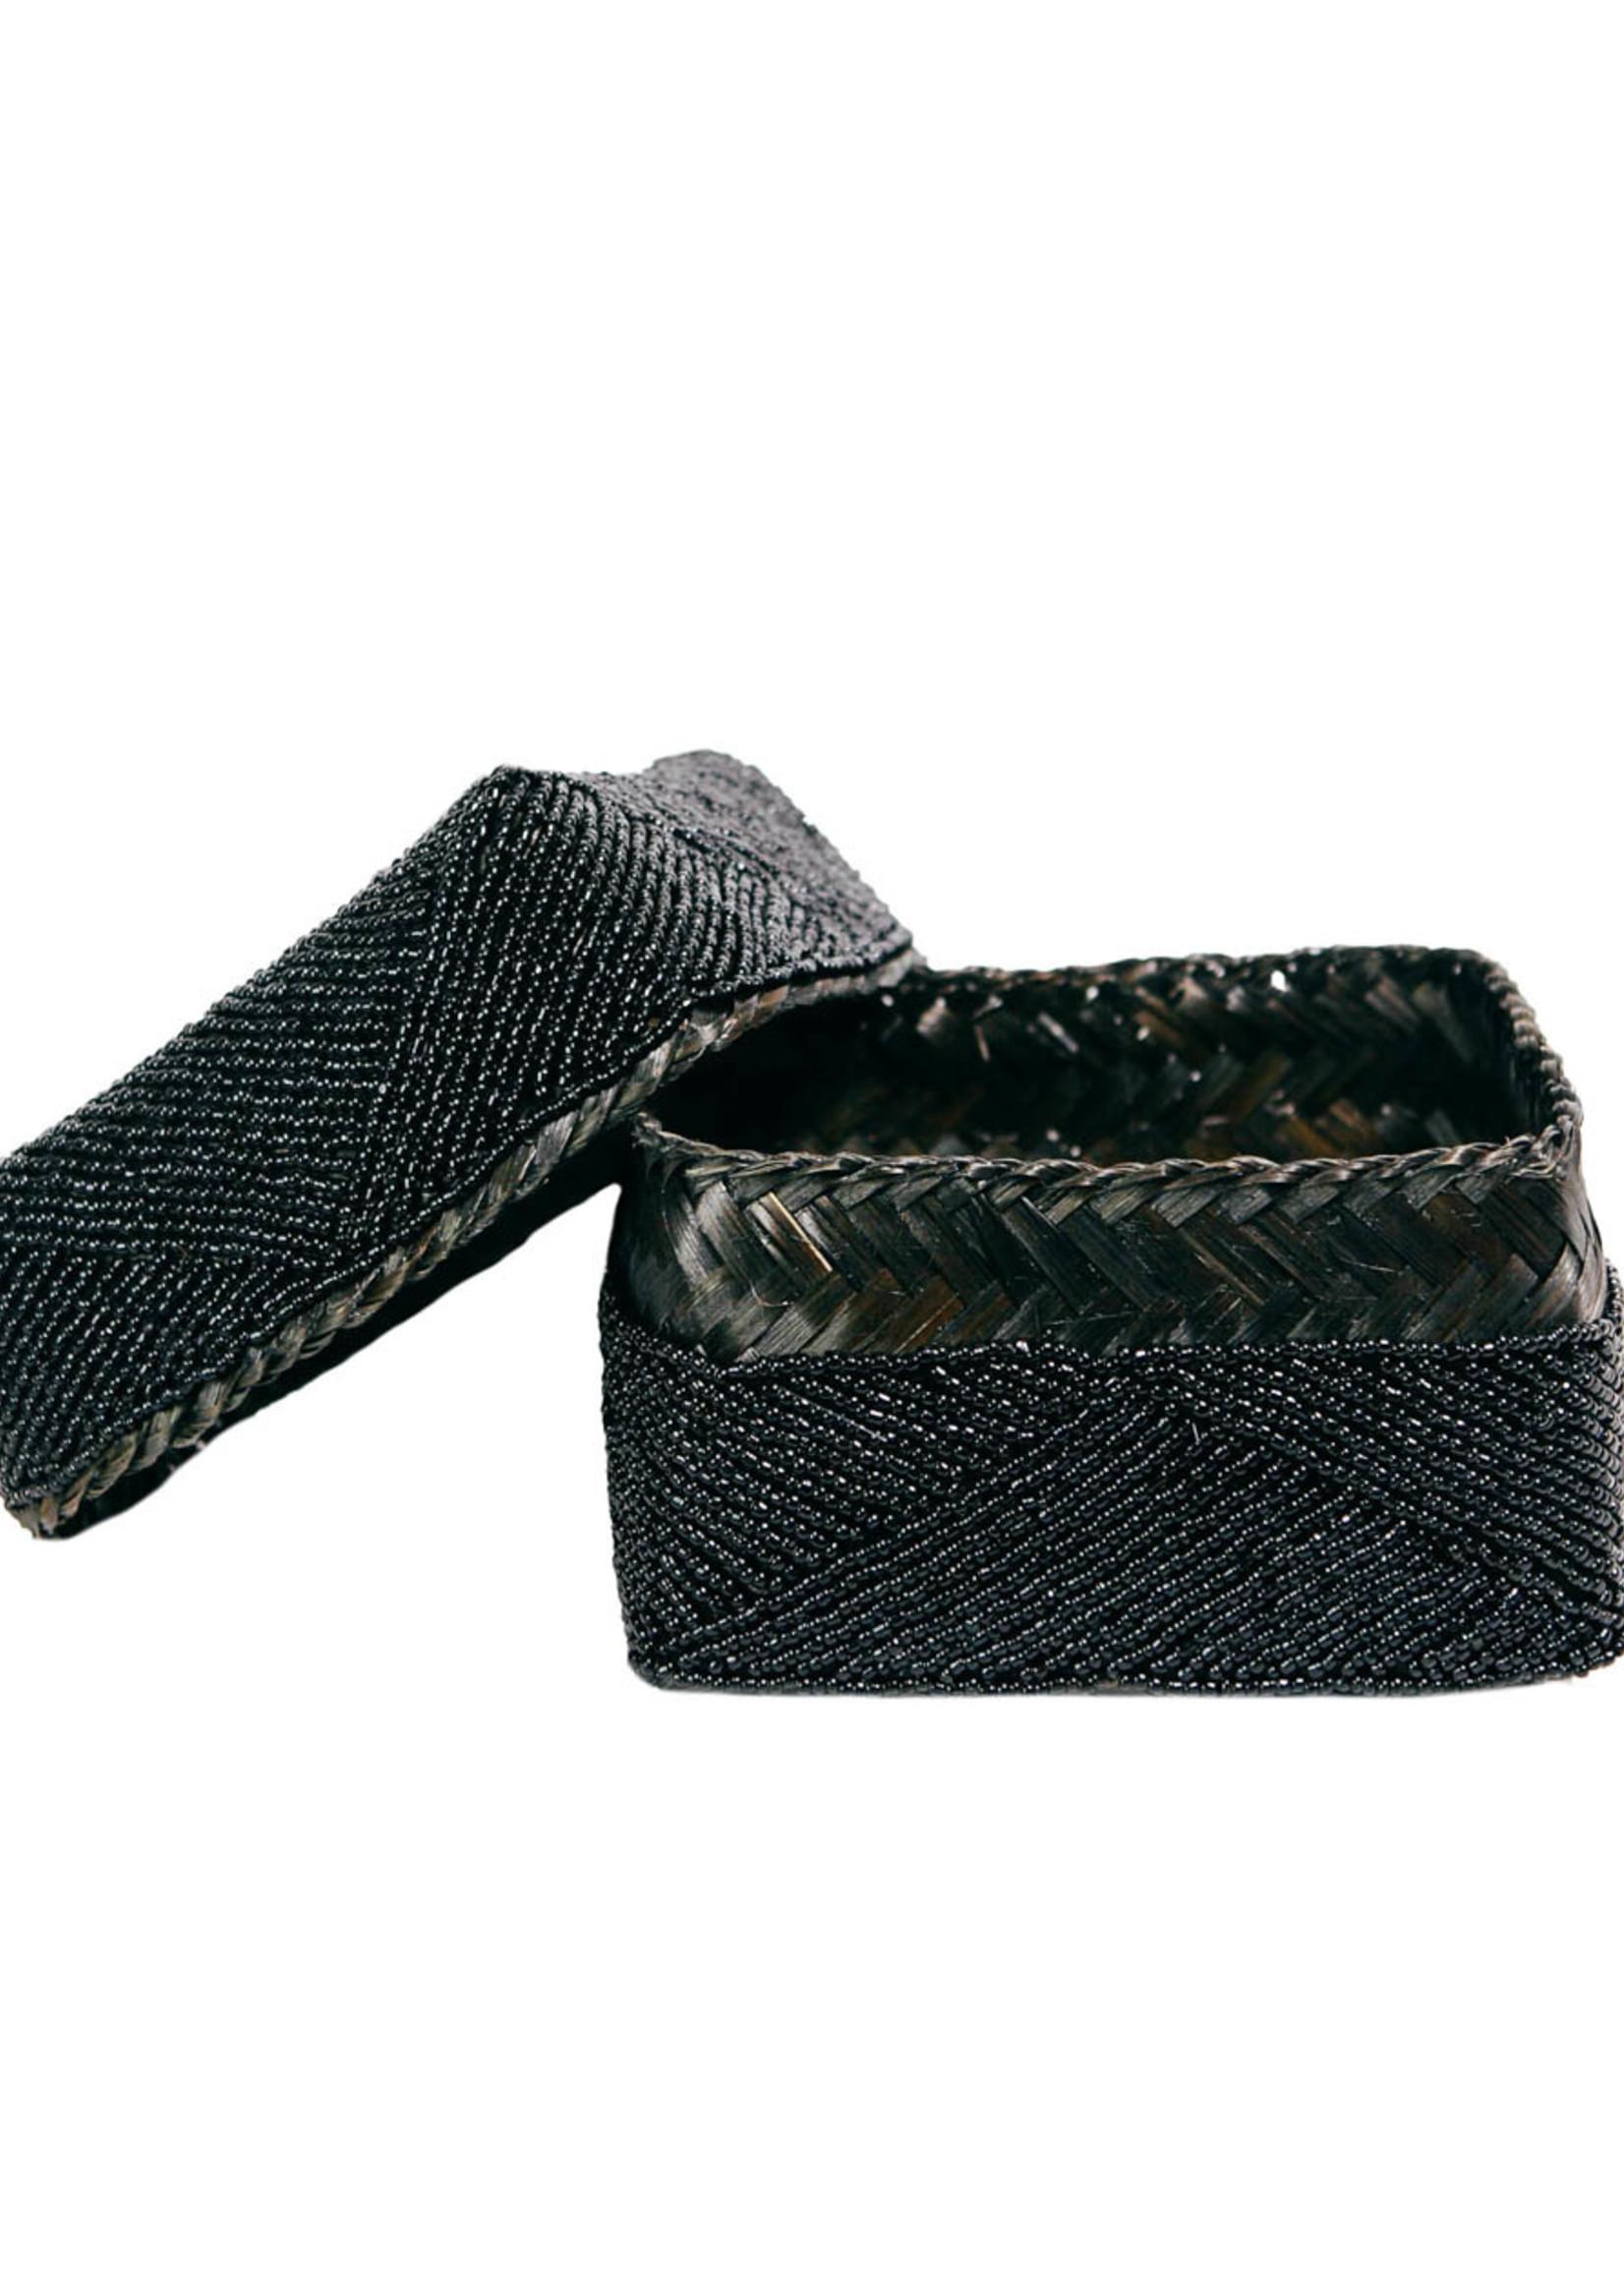 The Beaded Basket - Black - S